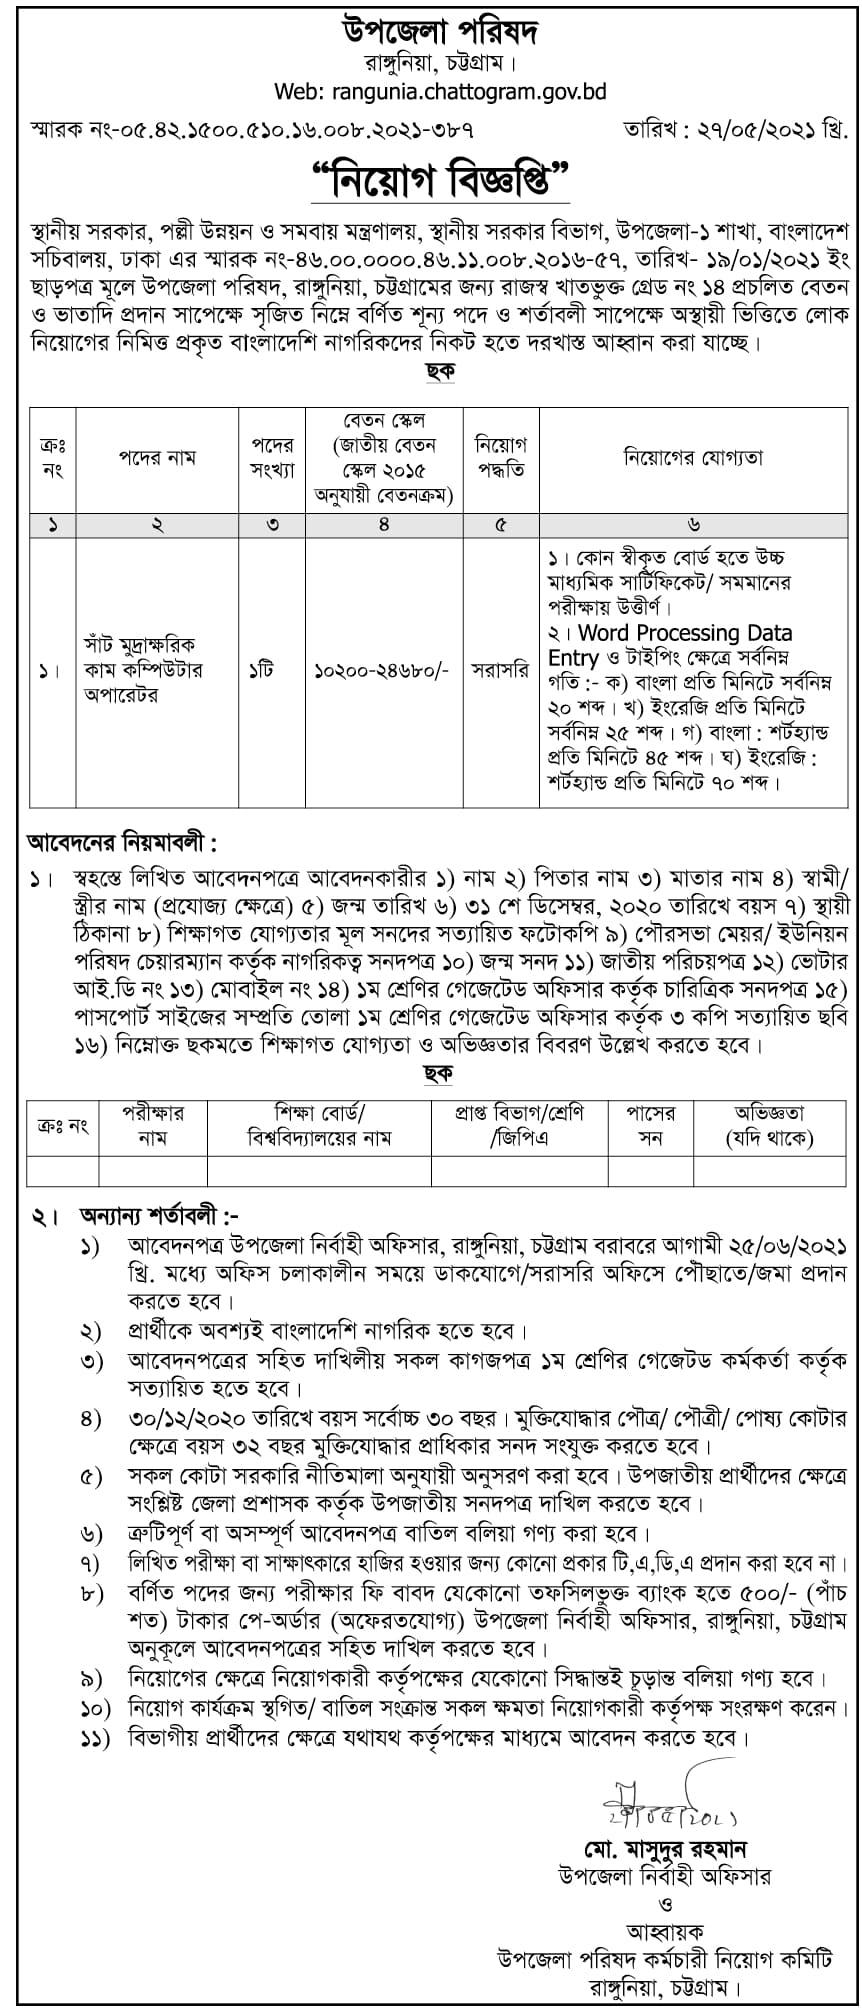 Rangunia Upazila Parishad Job Circular 2021